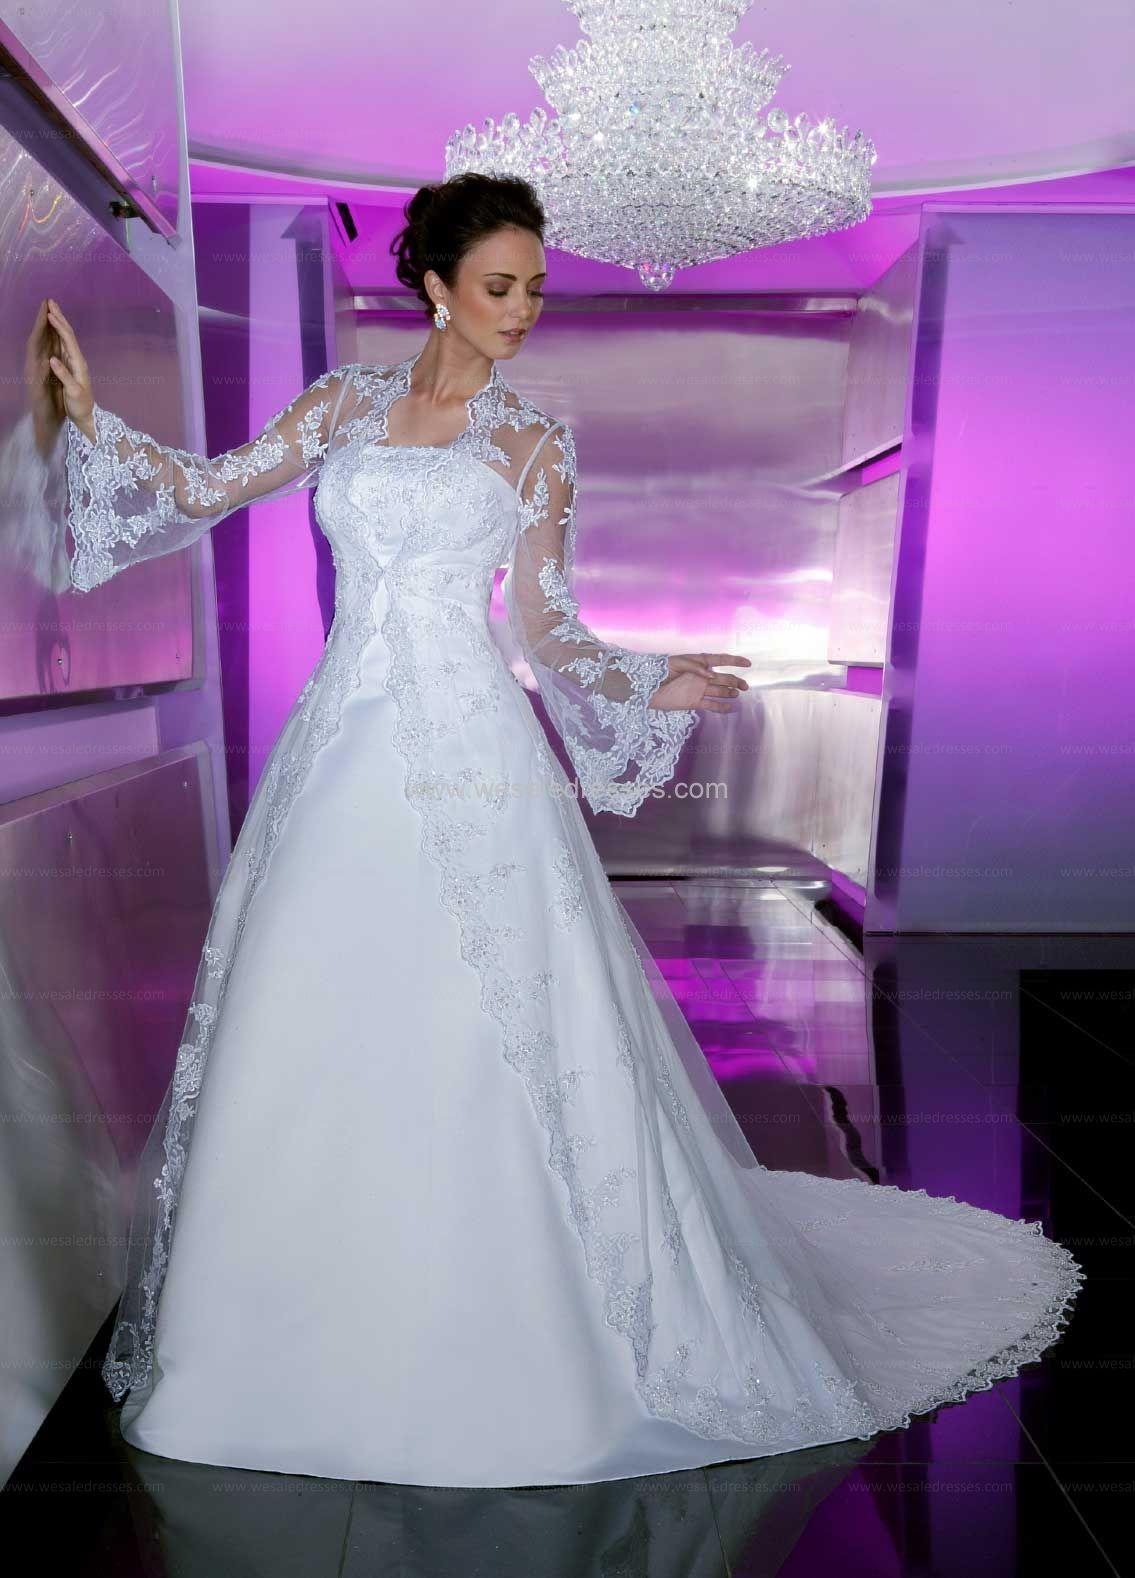 plus size wedding dresses with sleeves | wedding dresses | Pinterest ...